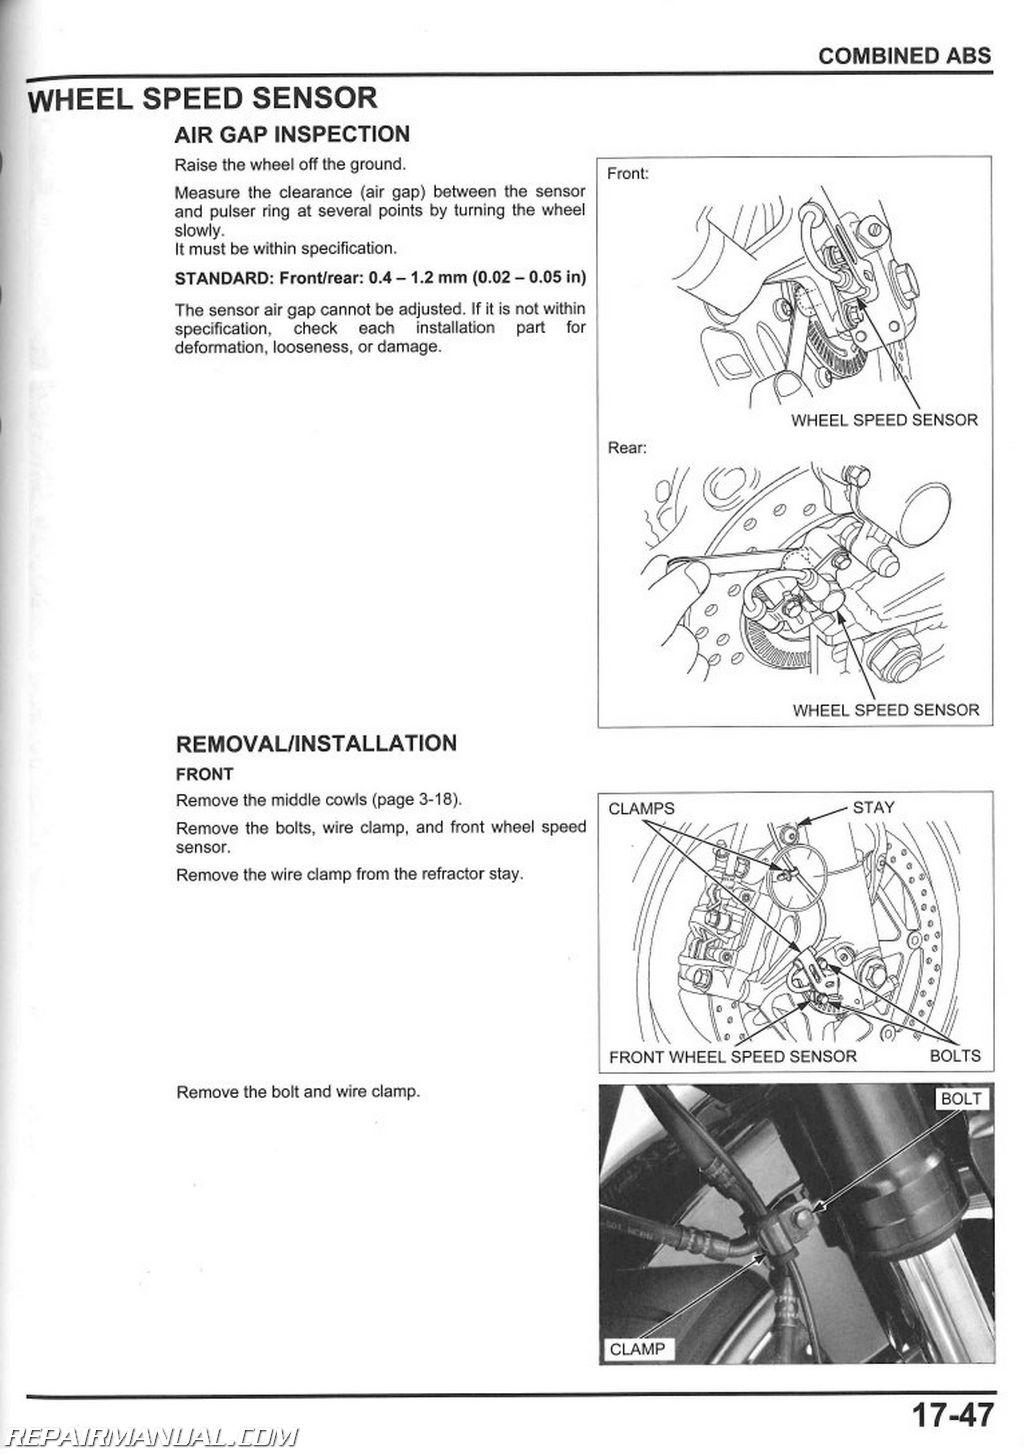 Honda Crf50 Wiring Diagram 2008 2016 Honda Cbr1000rr Motorcycle Service Manual